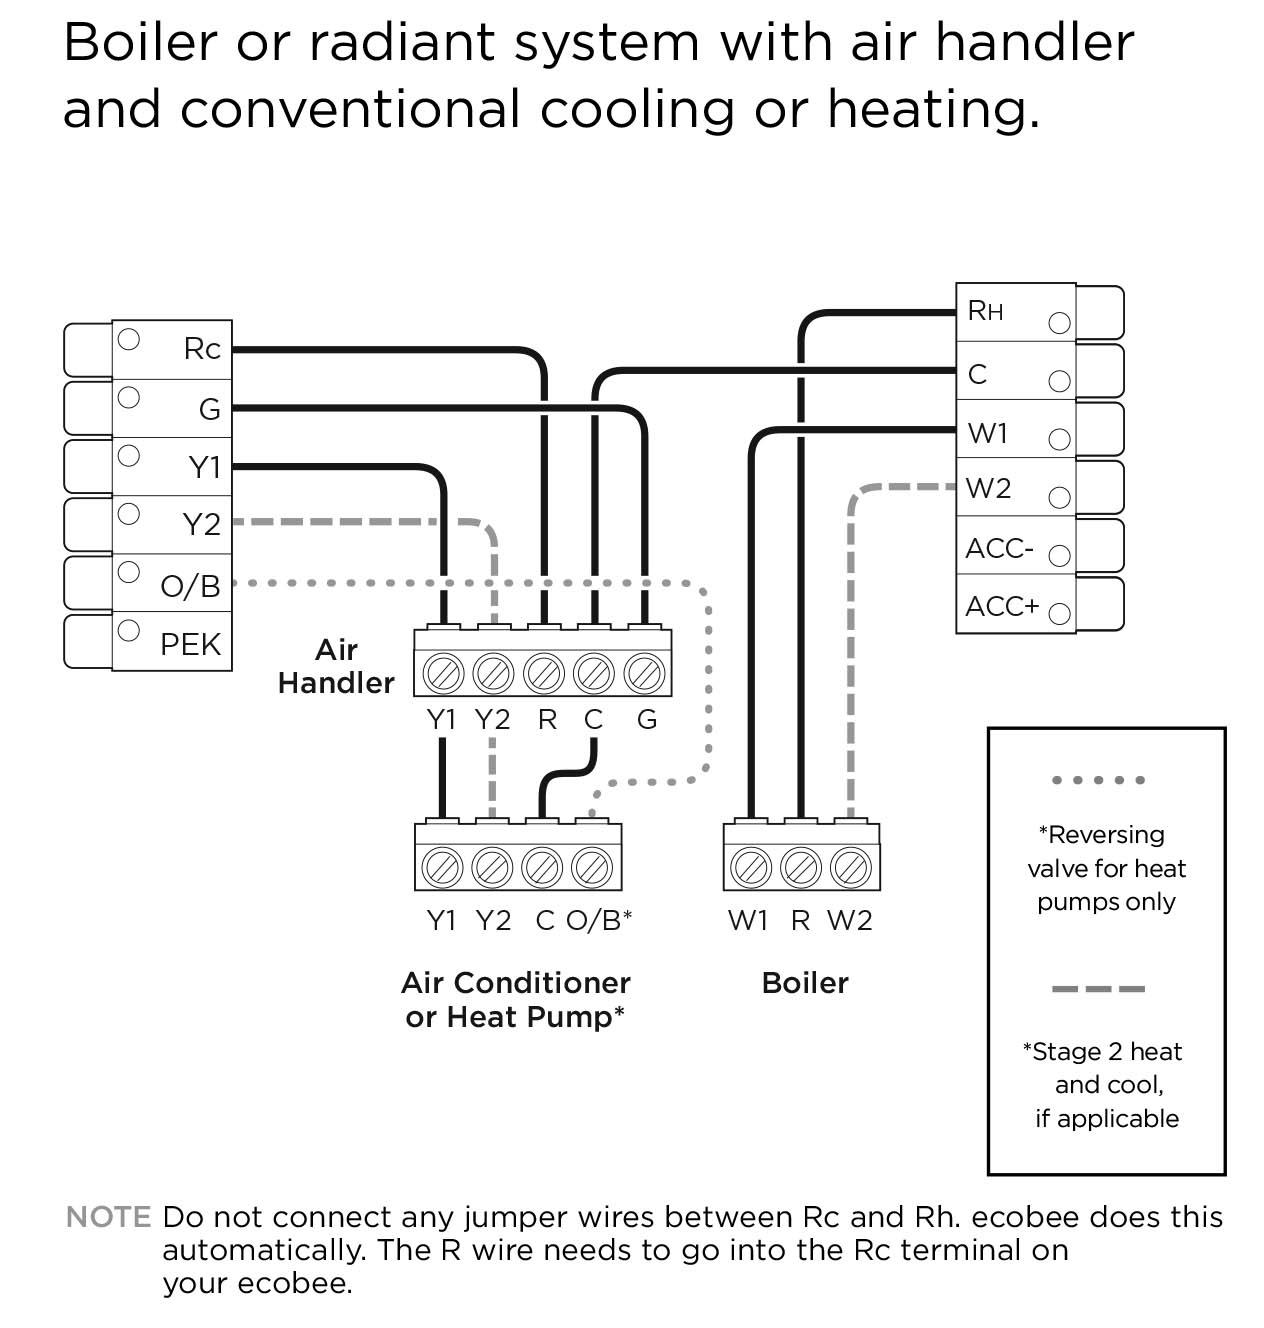 Ecobee4 Wiring Diagrams – Ecobee Support - Ecobee4 Wiring Diagram